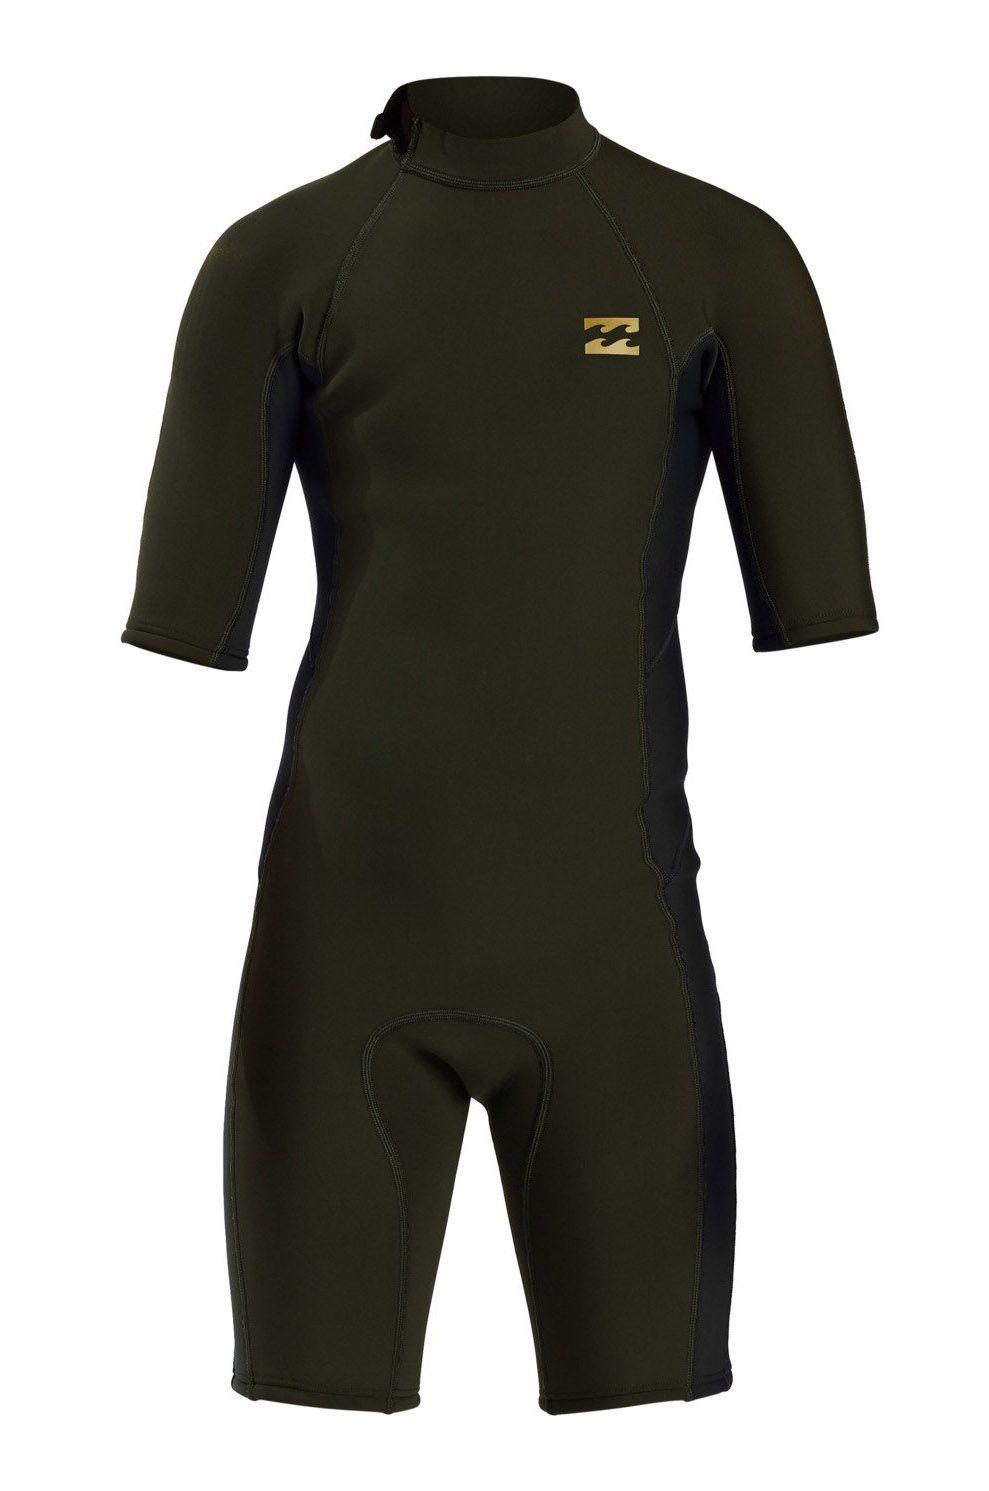 Billabong Wetsuit 202 BOYS ABSO BZ FL Military 2x2mm